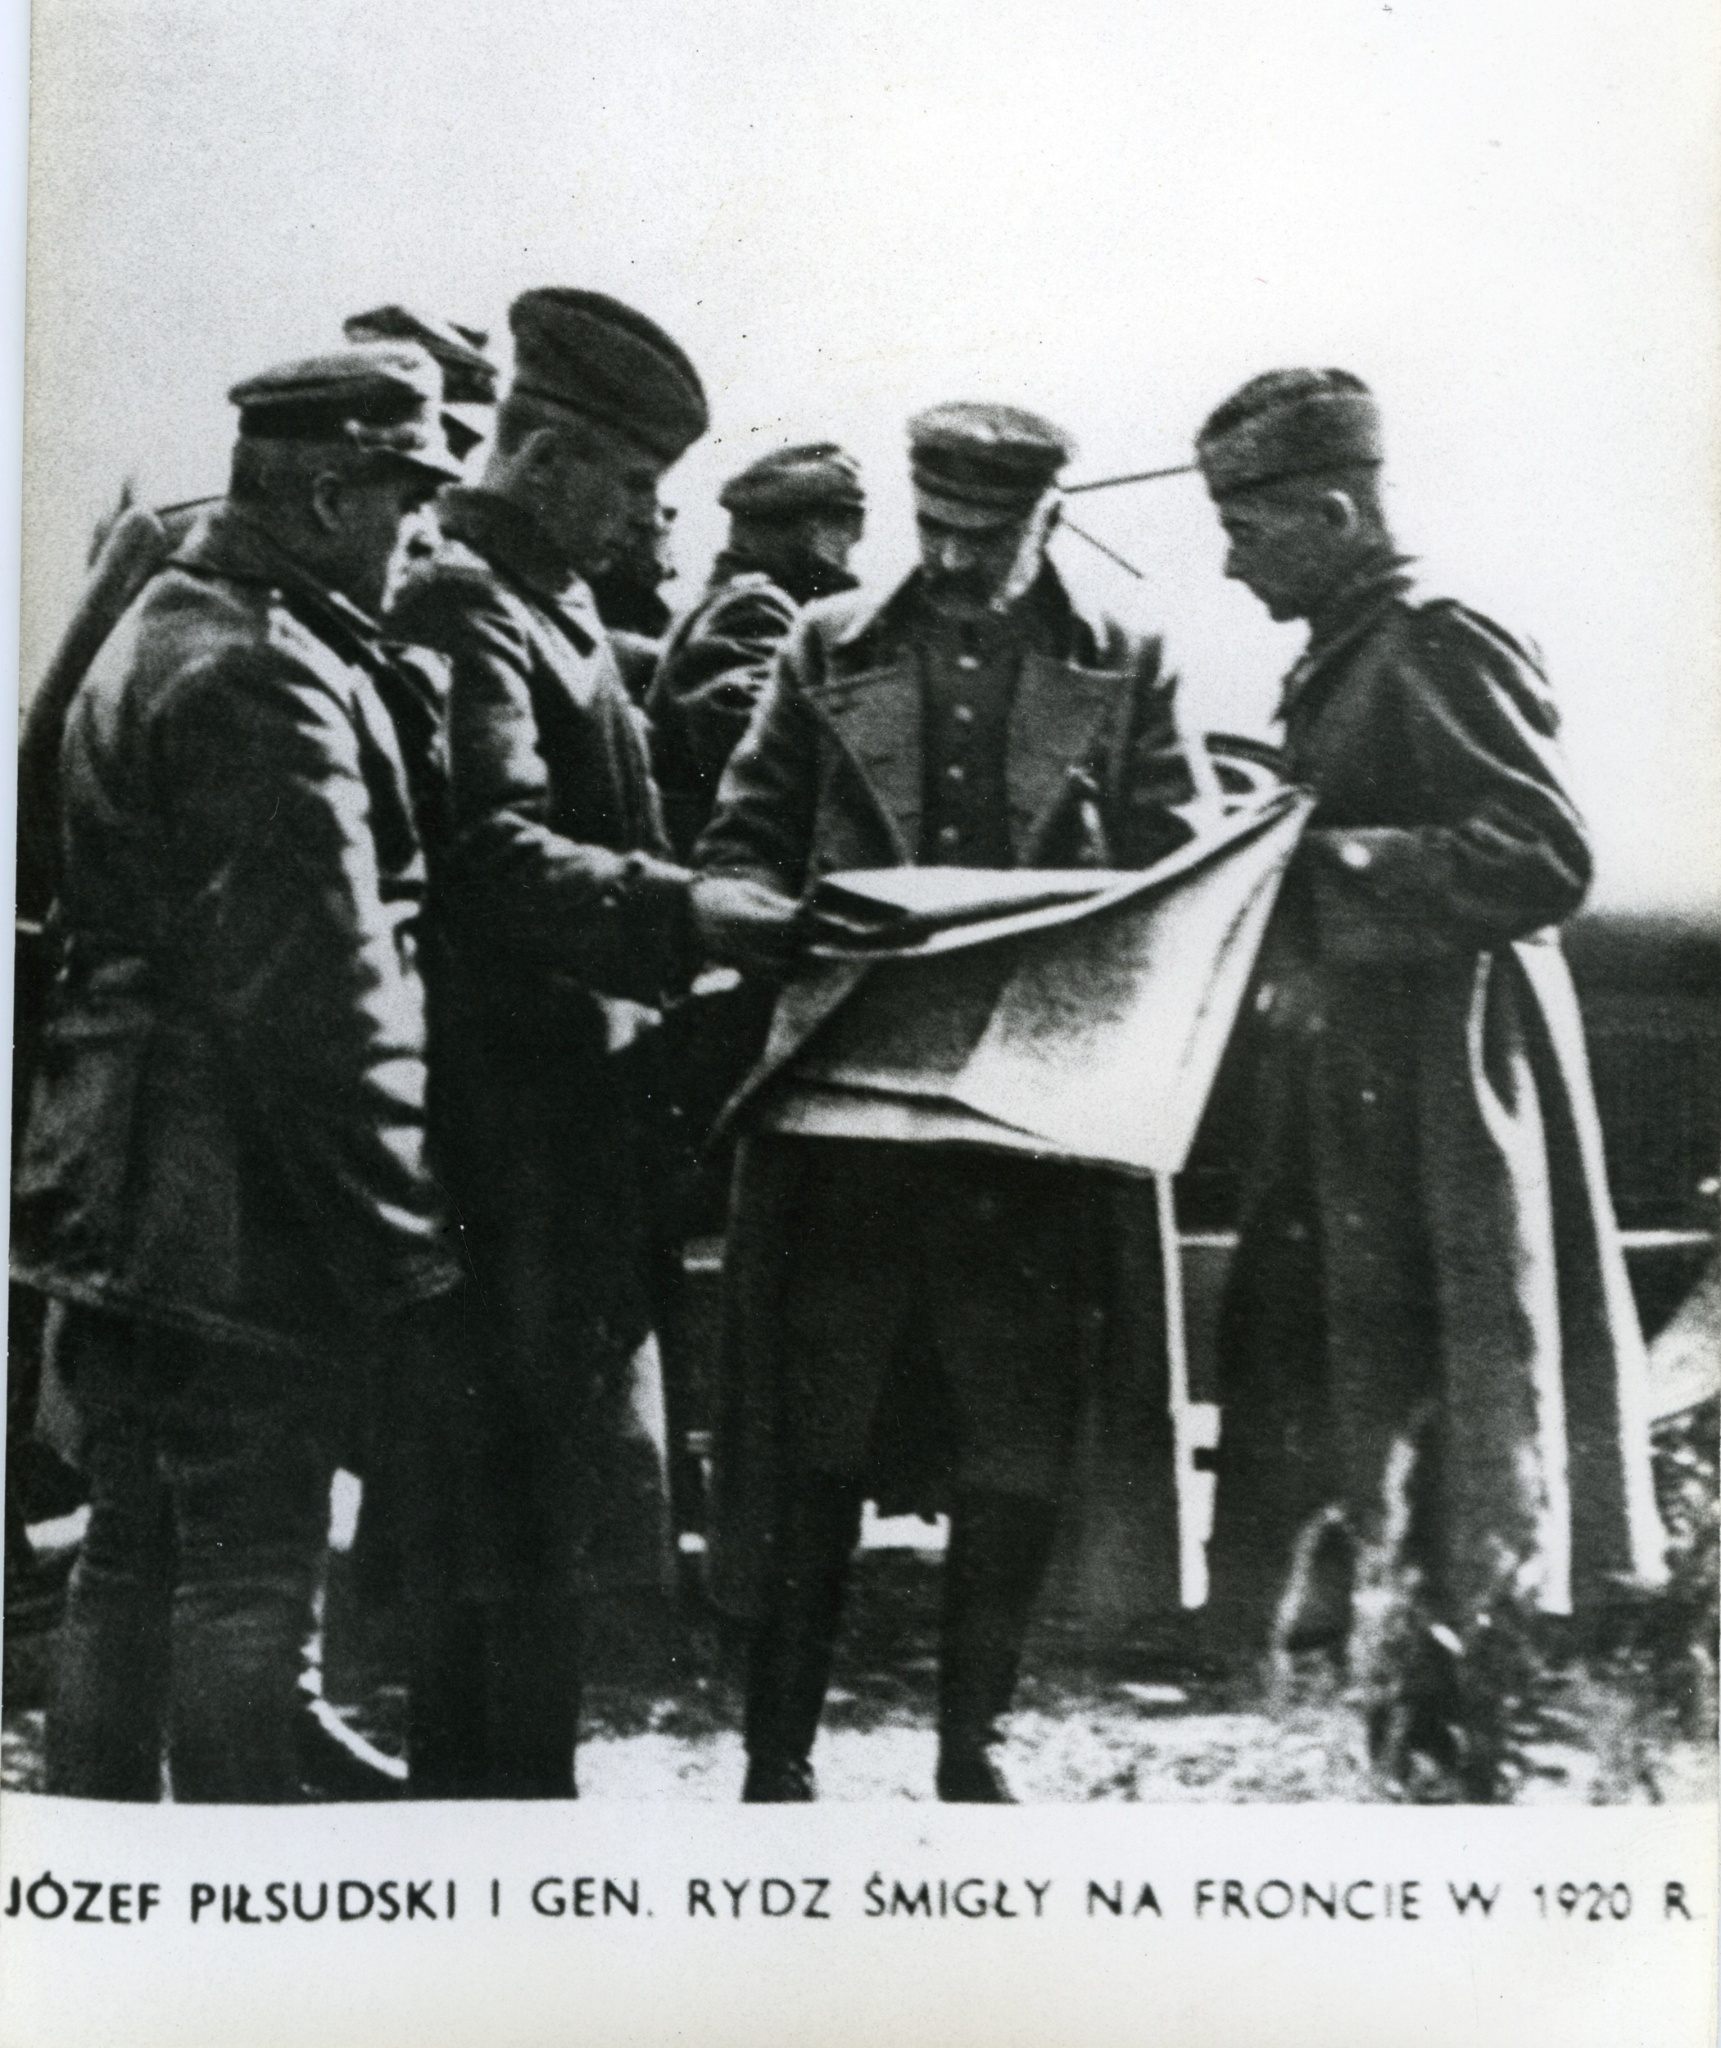 <div class='inner-box'><div class='close-desc'></div><span class='opis'>Józef Piłsudski, generał Edward Rydz Śmigły na froncie.</span><div class='clearfix'></div><span>Cote du document FIL03170</span><div class='clearfix'></div><span>© Instytut Literacki</span></div>